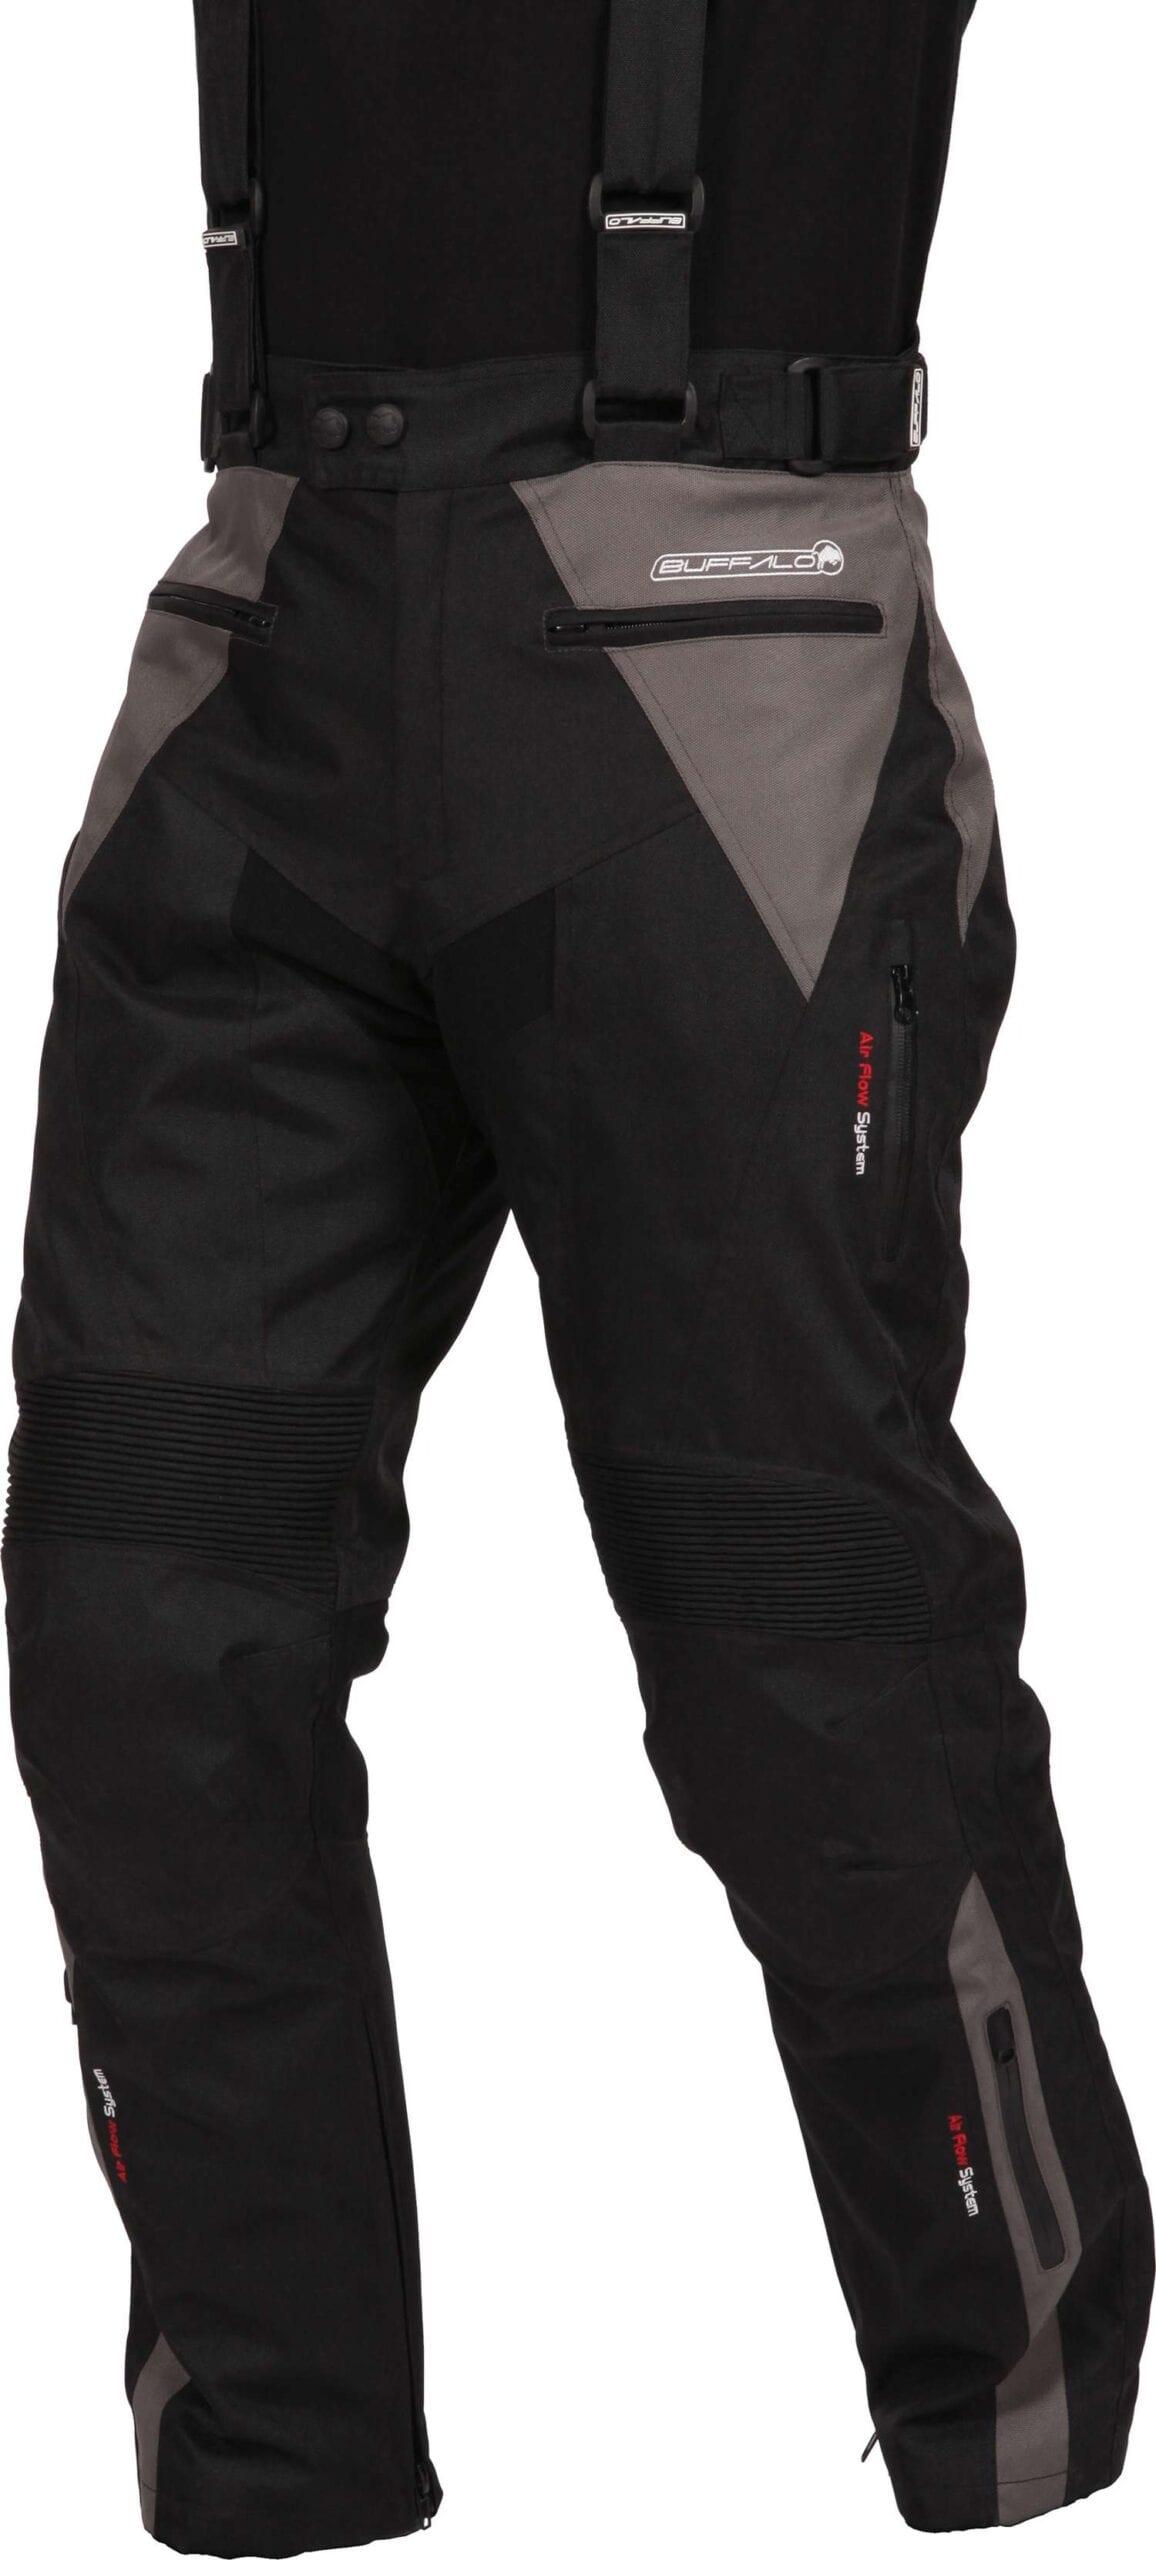 Buffalo-Sonar-trousers